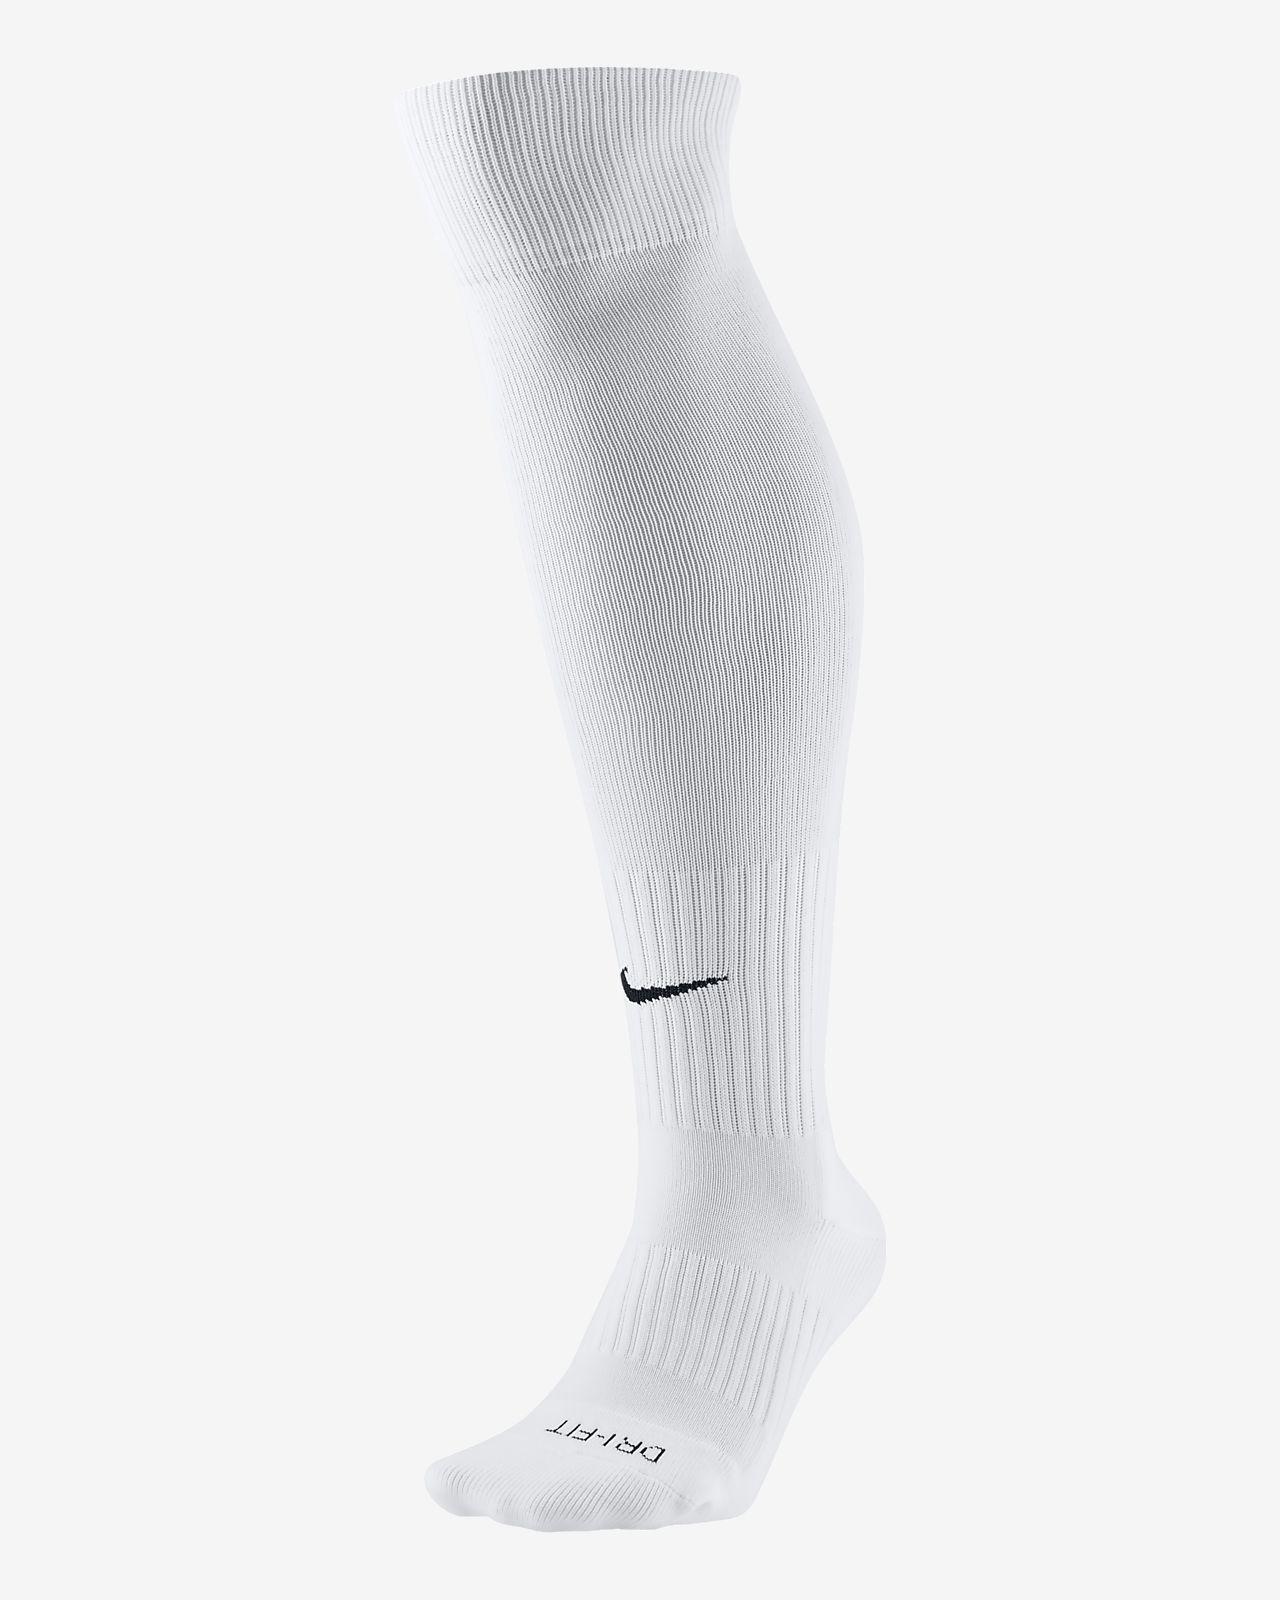 Nike Classic 2 gepolsterte Over-the-Calf-Fußballstutzen